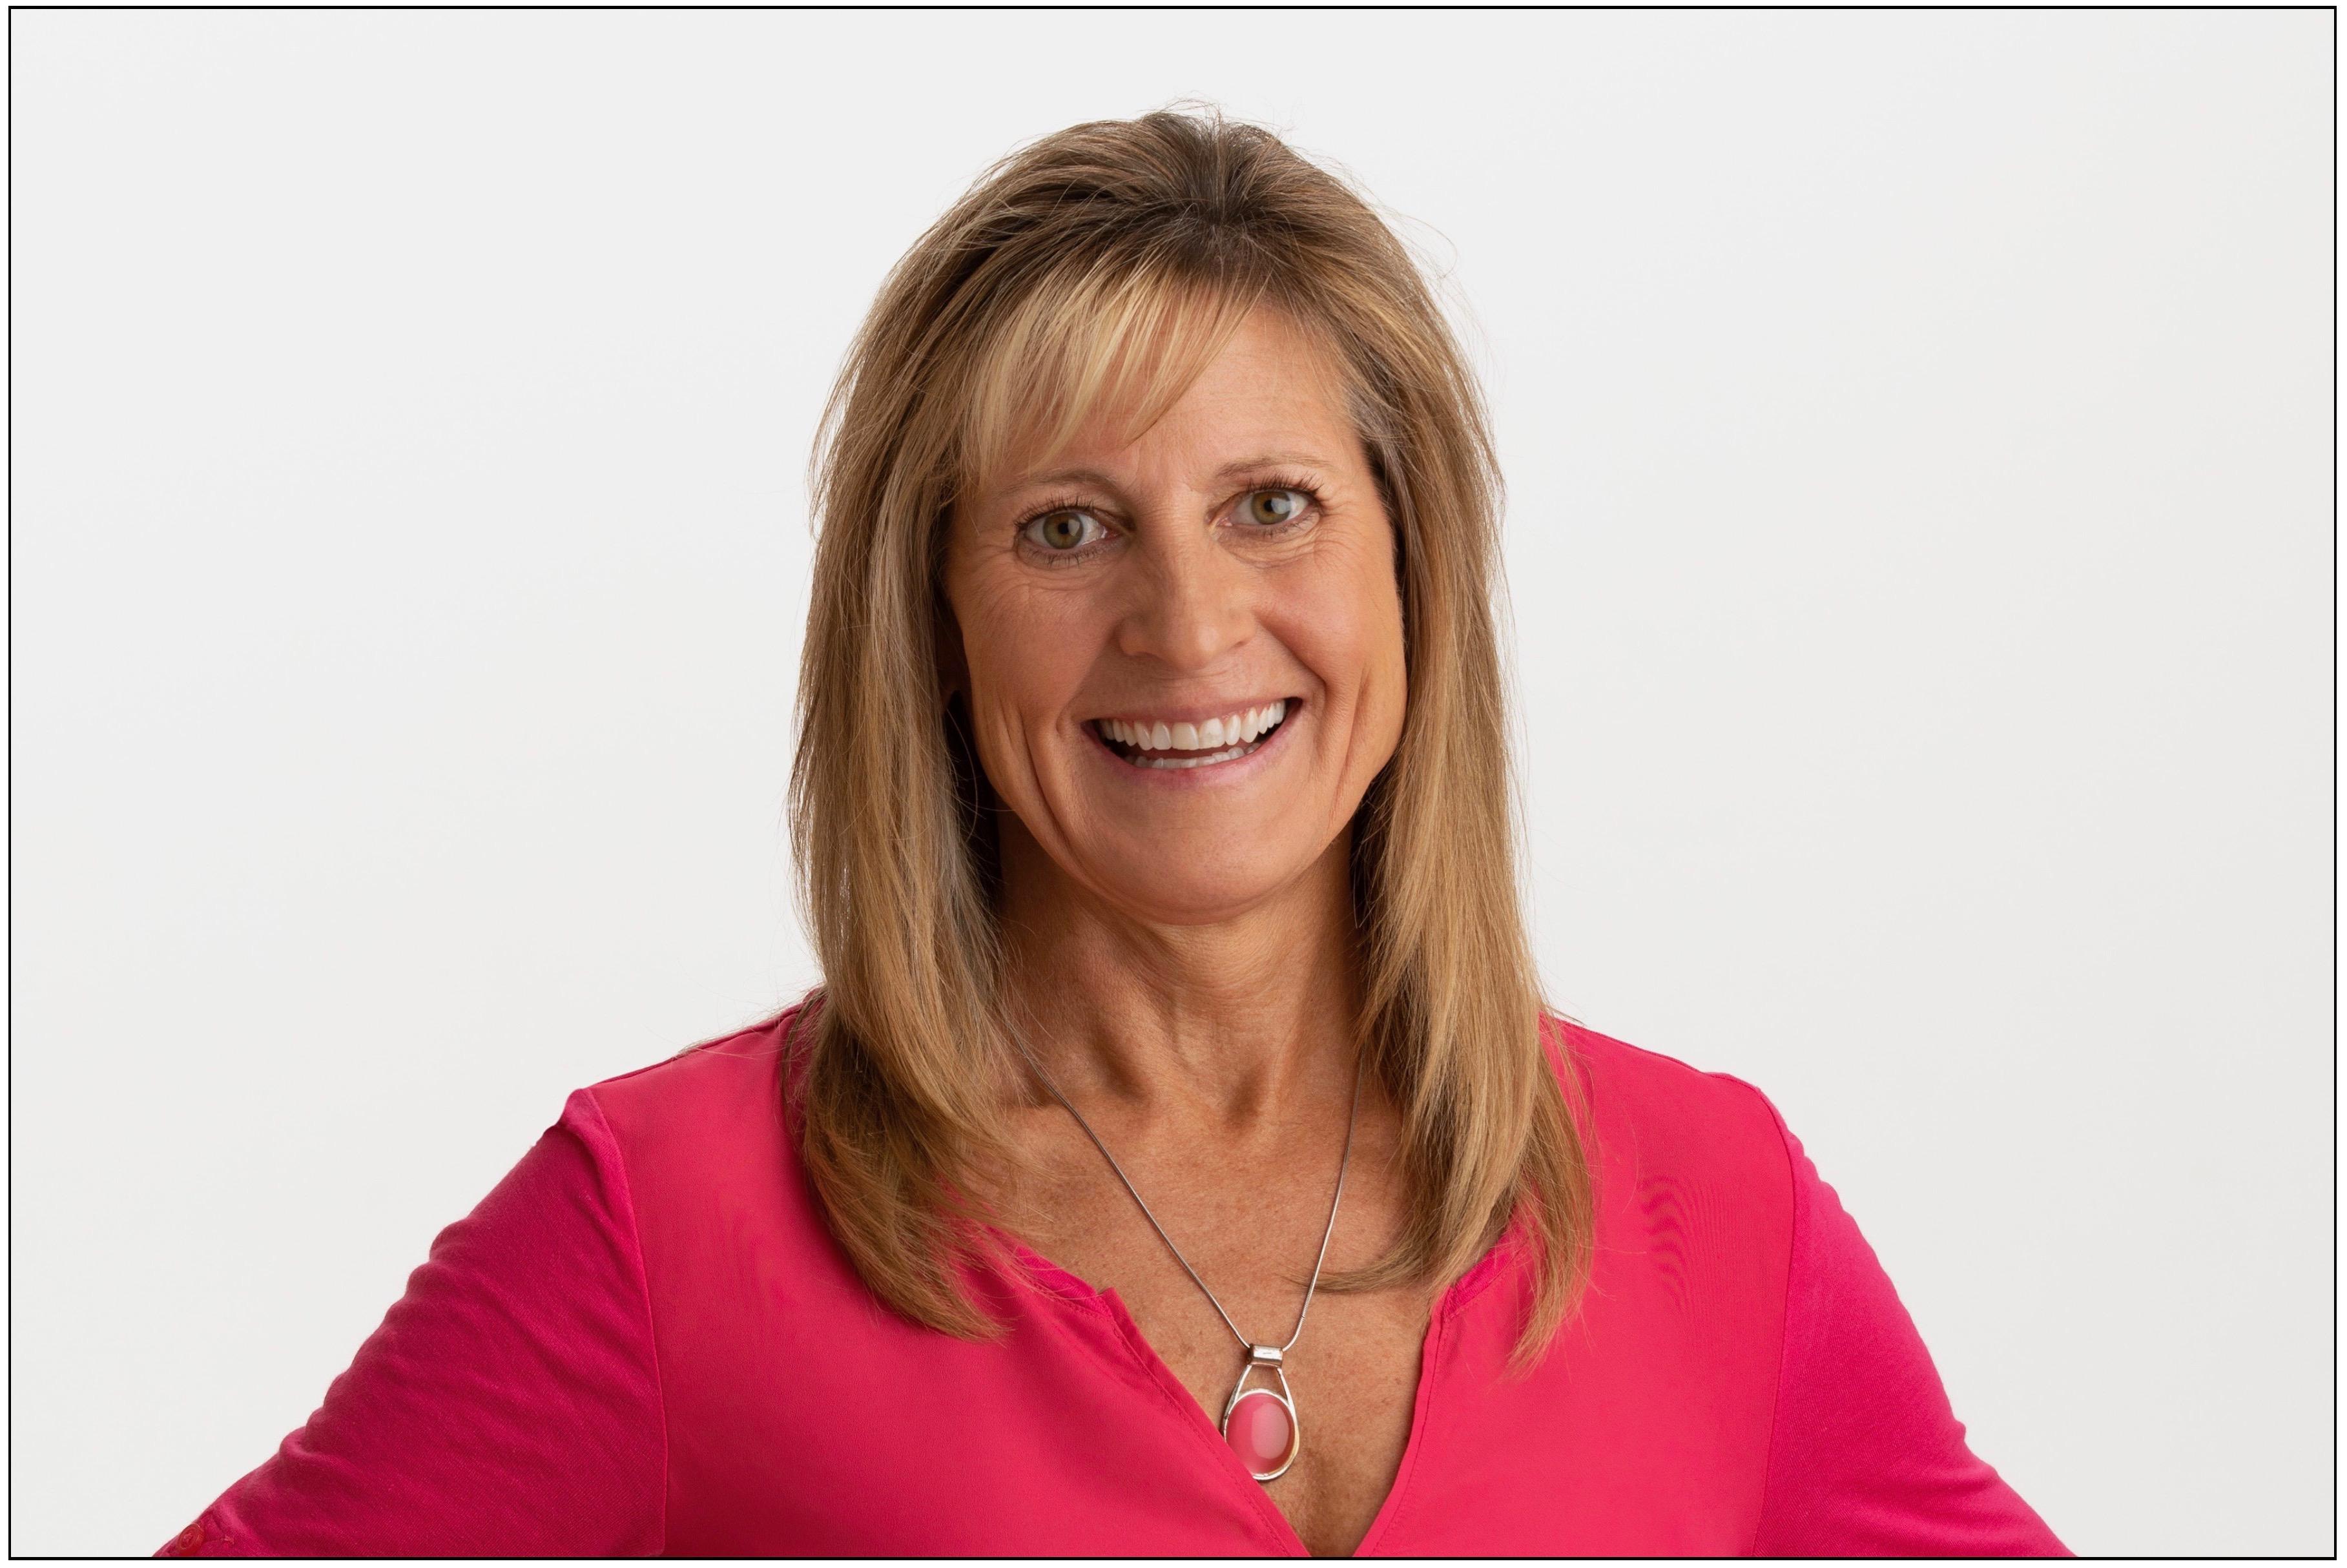 Cristen Weber, Personal Insurance customer service